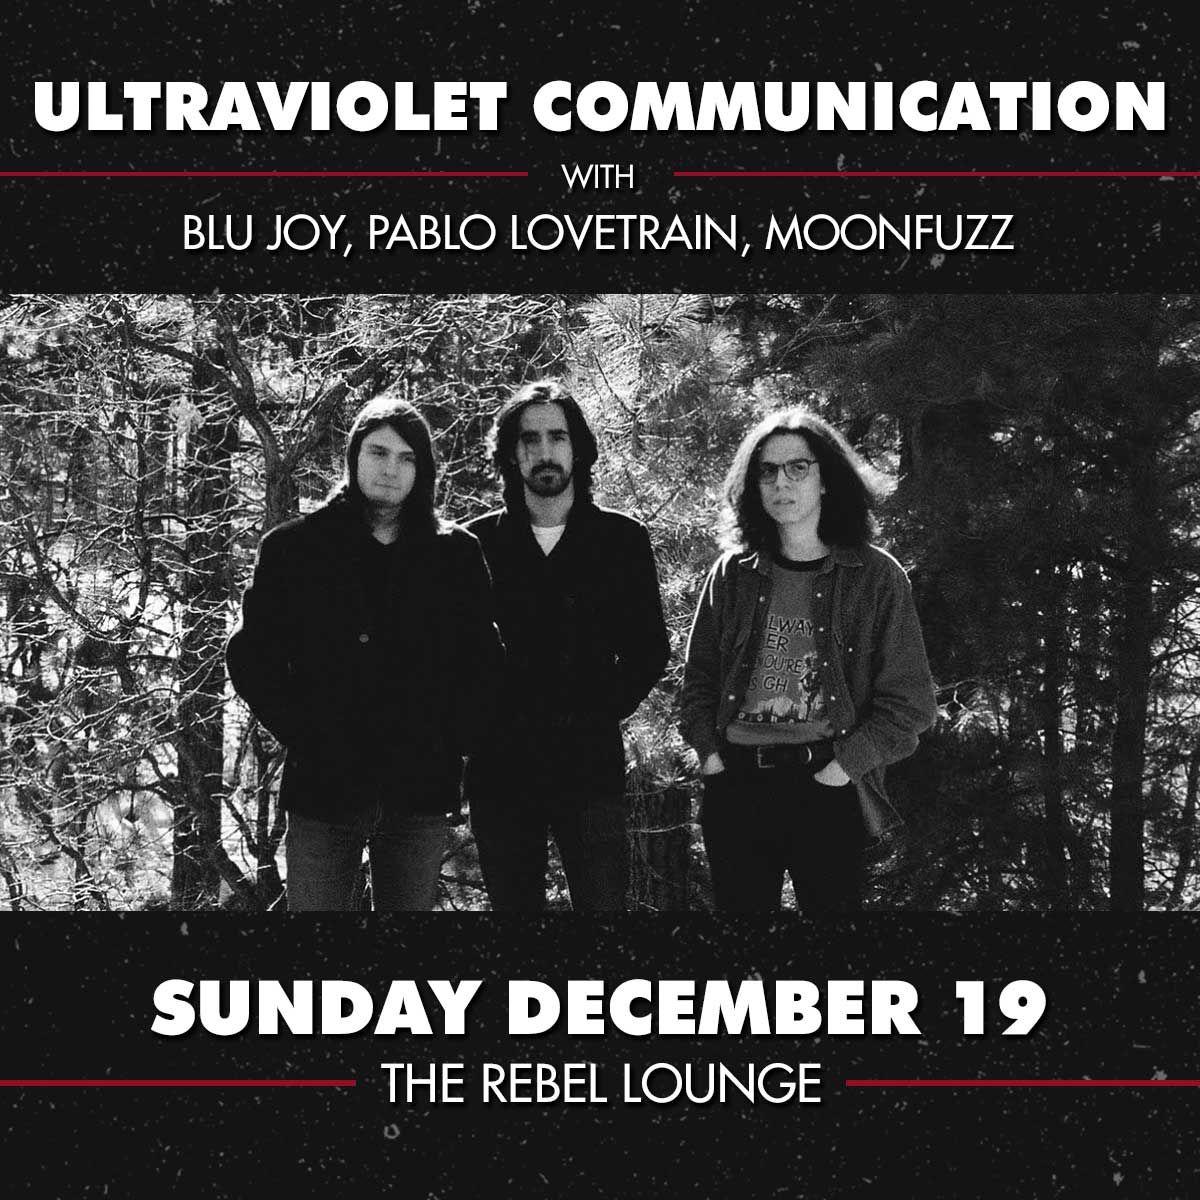 ULTRAVIOLET COMMUNICATION: